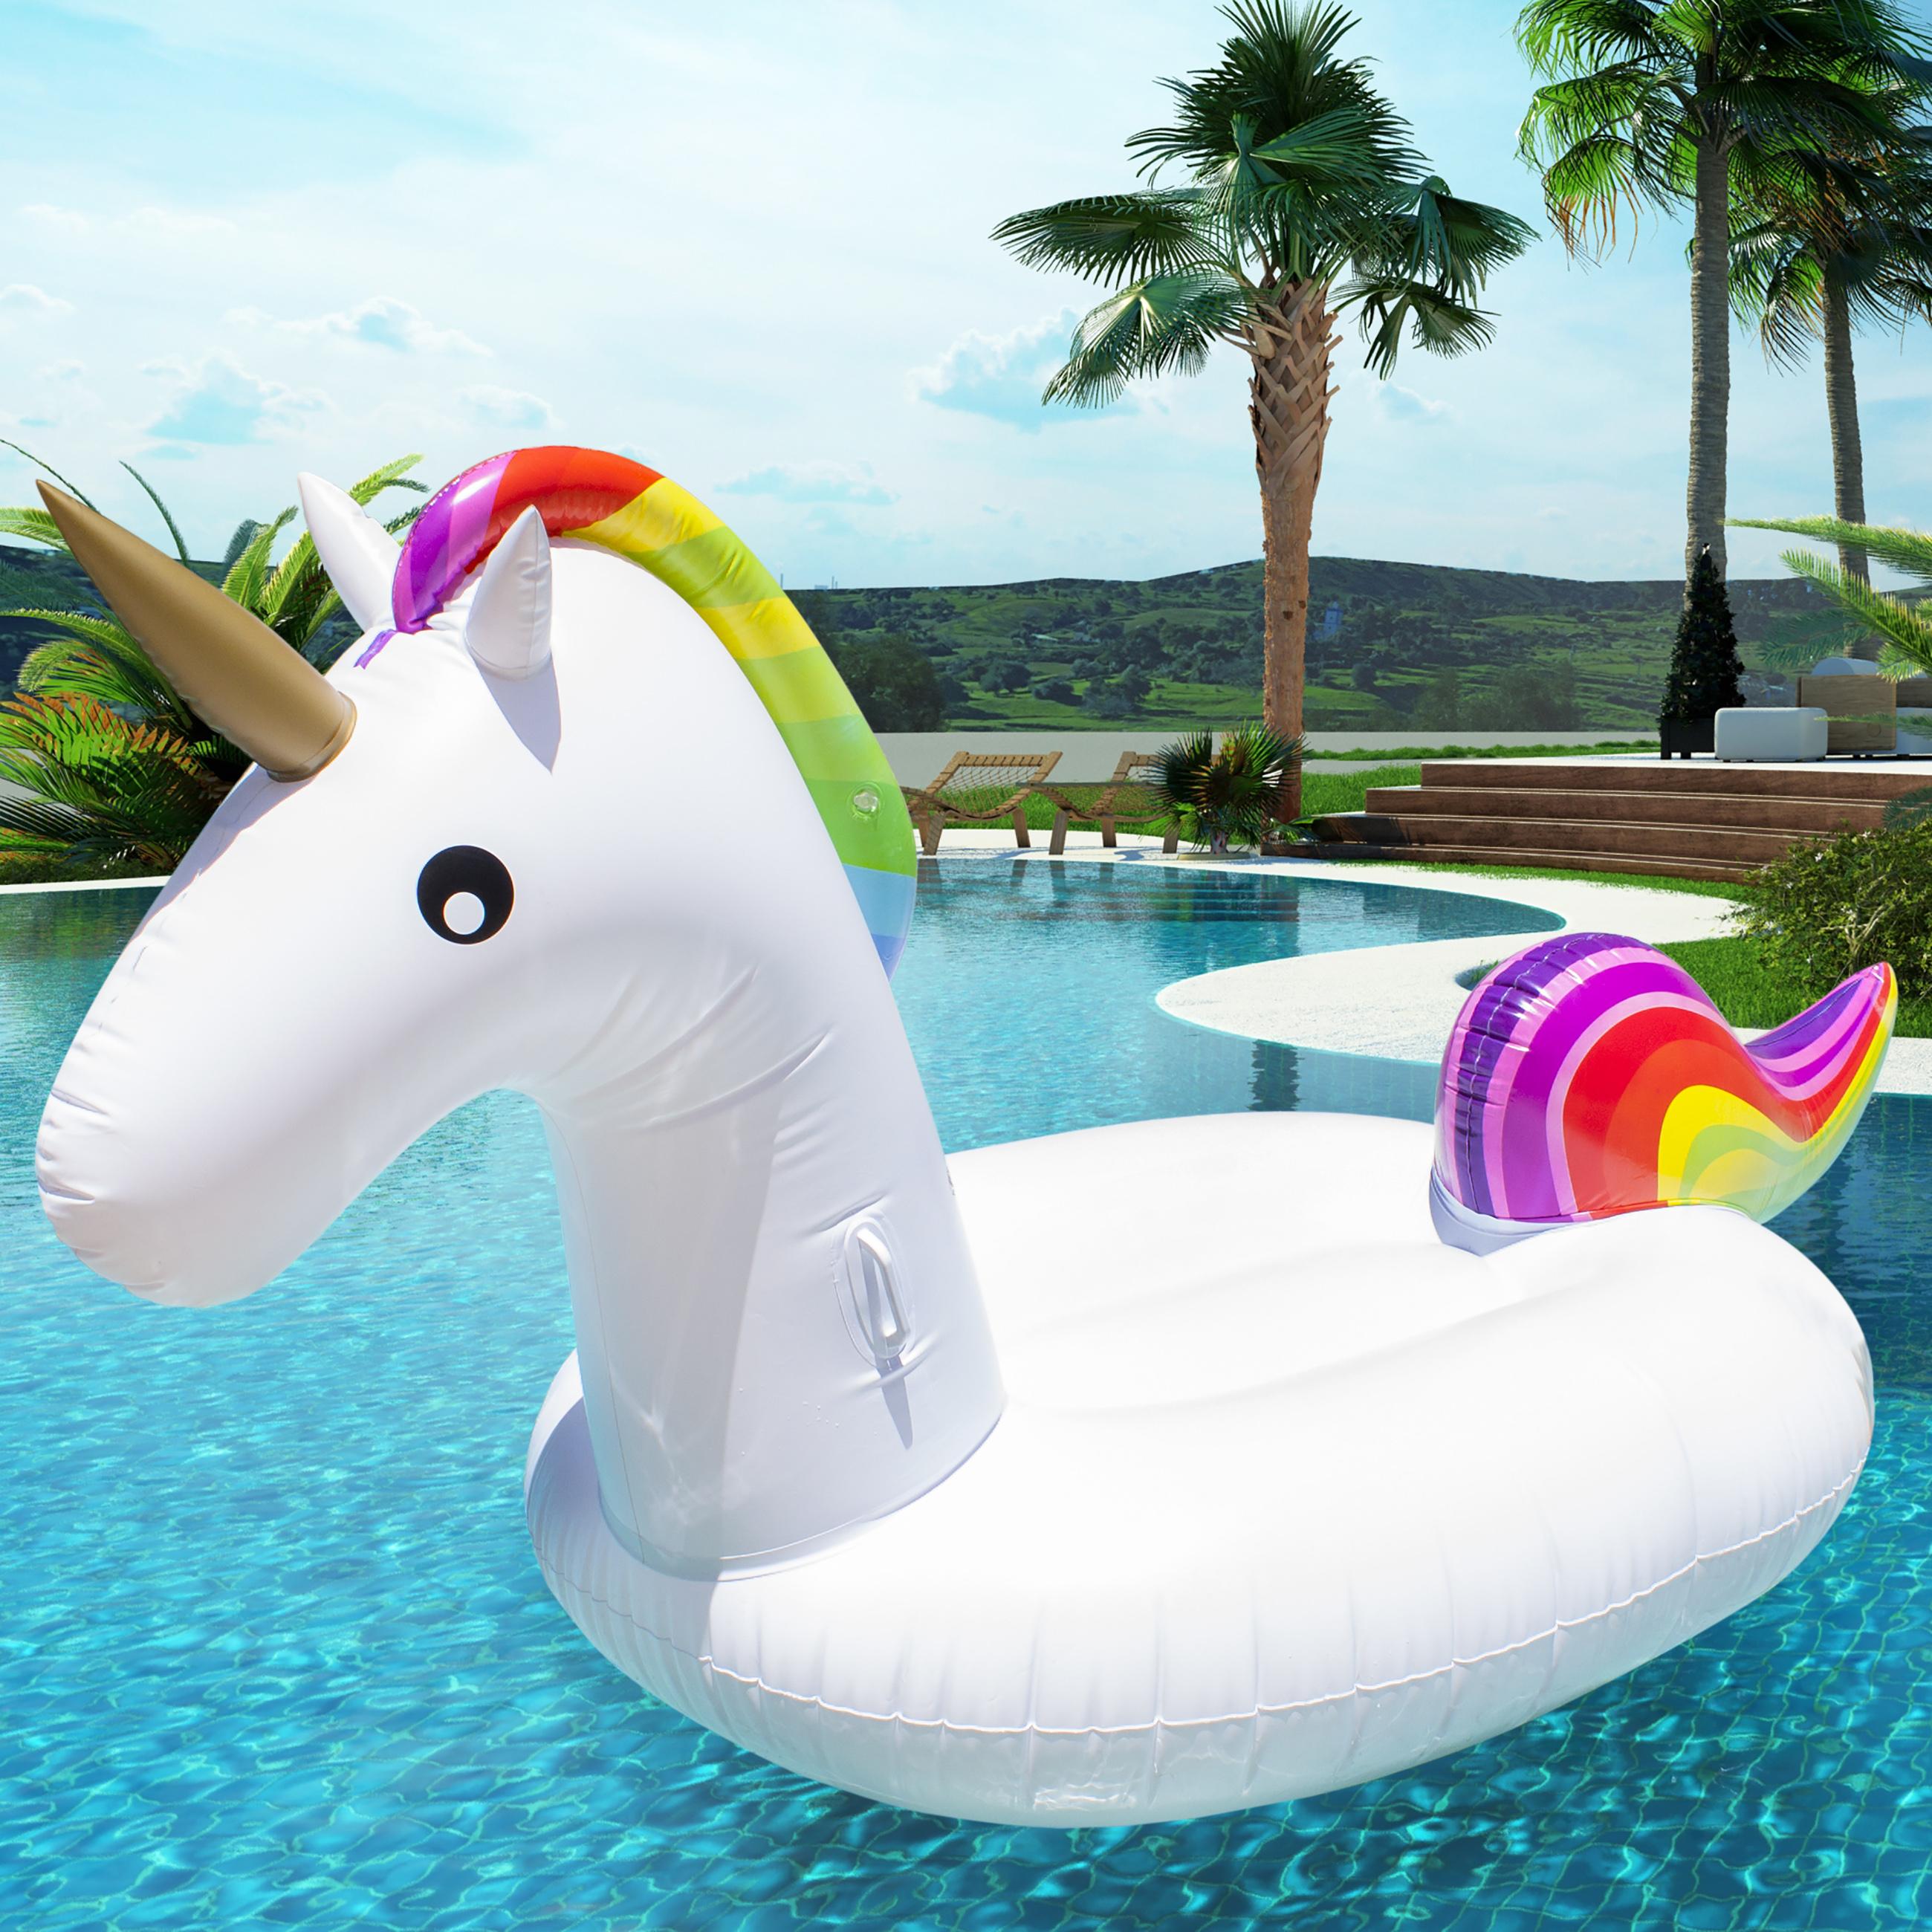 Giant Rainbow Inflatable Unicorn Pool Float Toy @WalMart.com - Was $130 $29.99